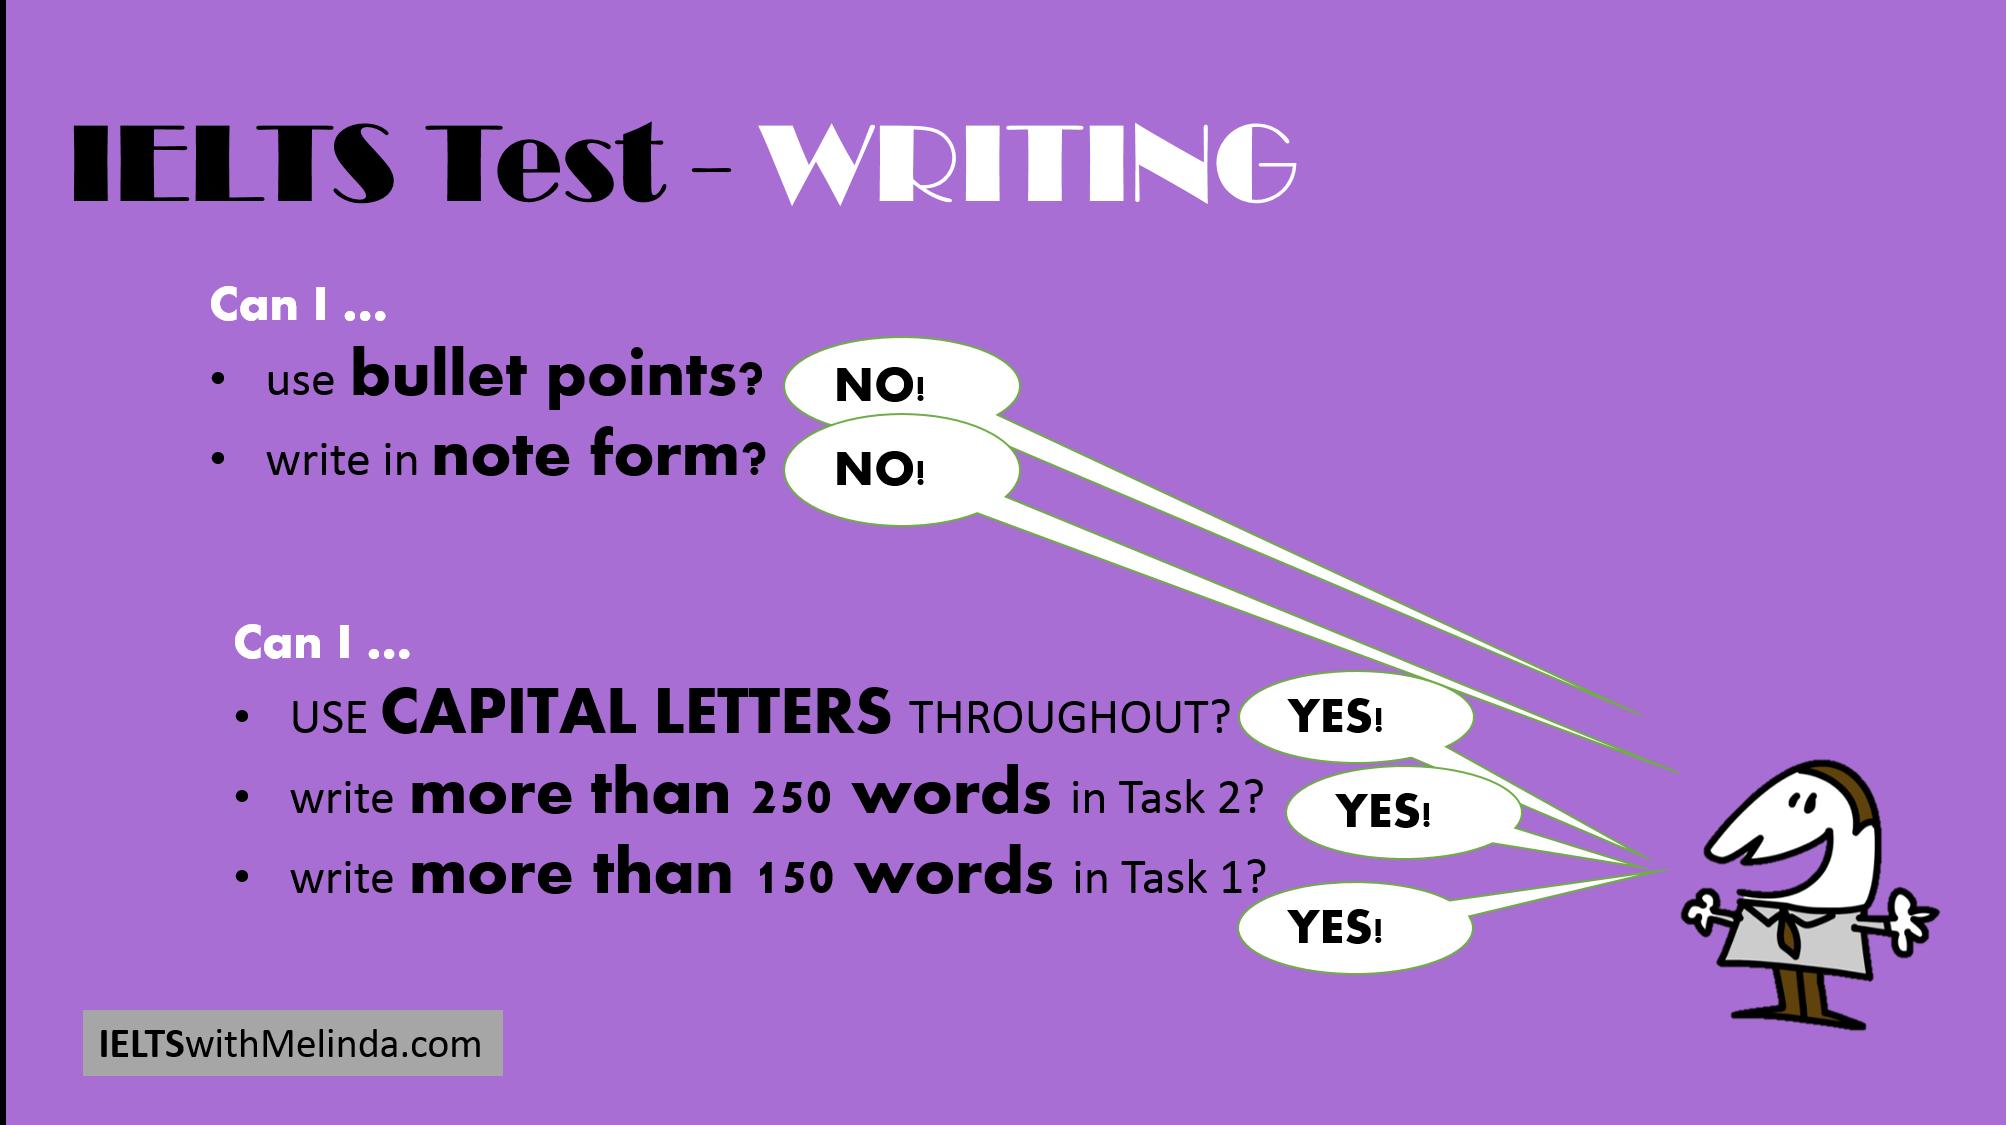 Writting help